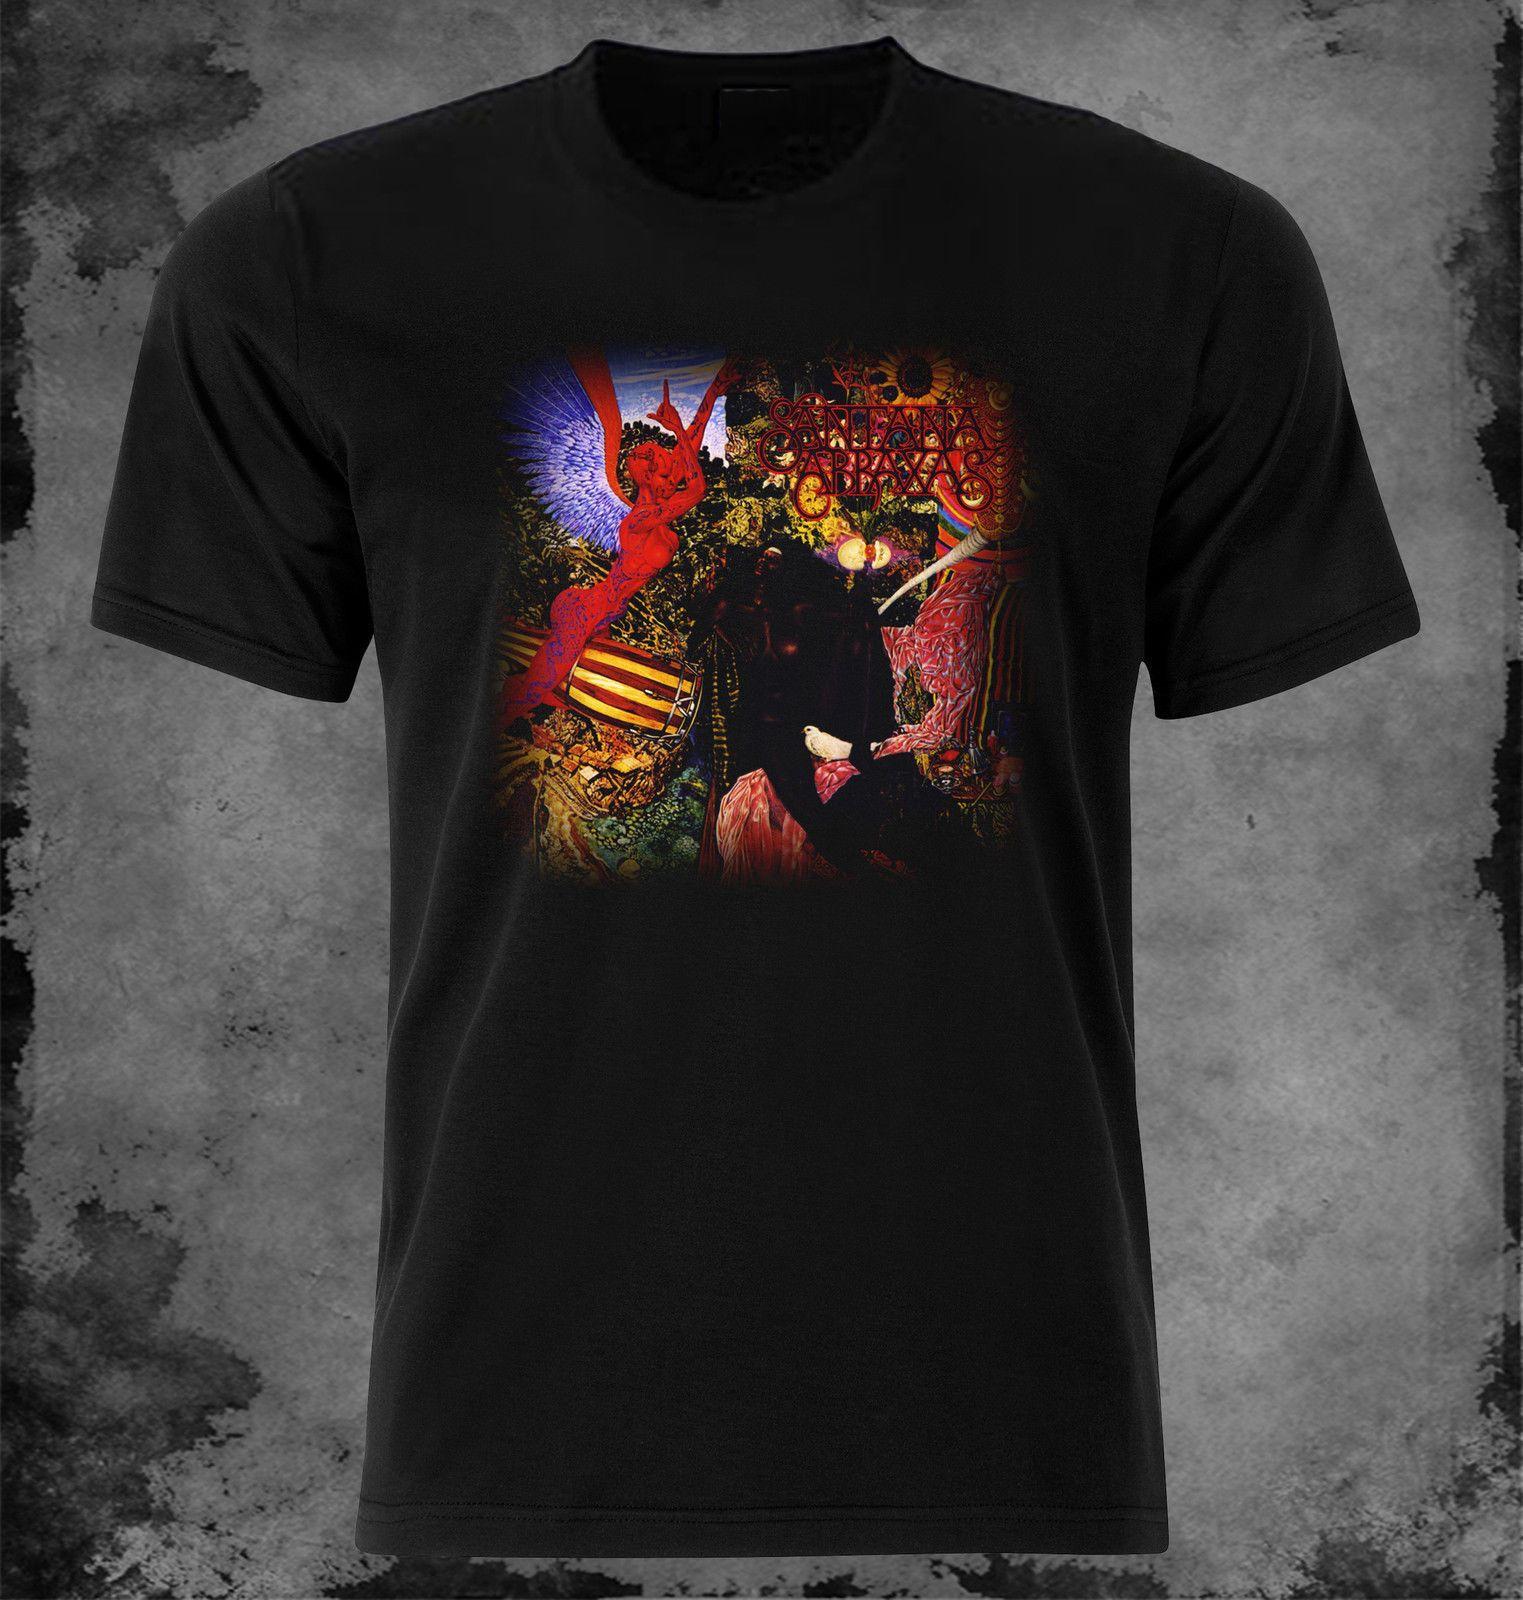 Shirt Du Com 05 12 T DHgate Santana Acheter De Yg07tshirt Abraxas SOfOH